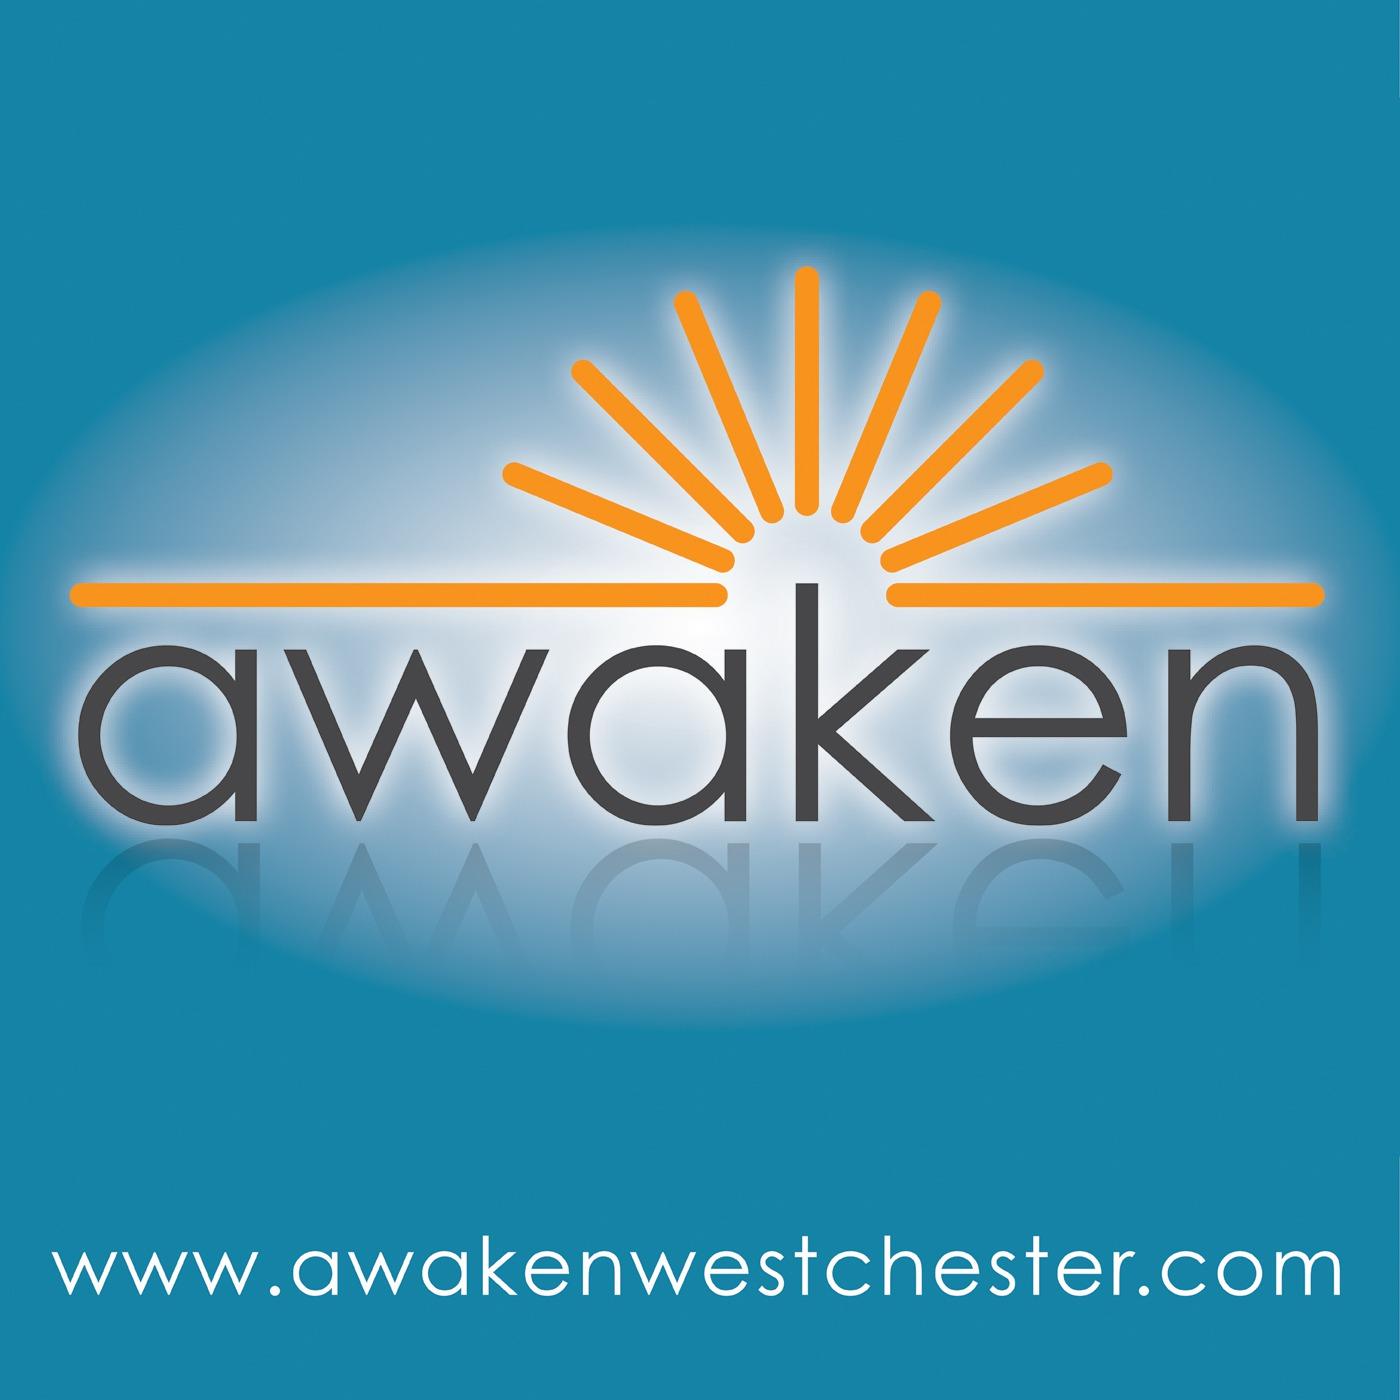 Awaken Westchester